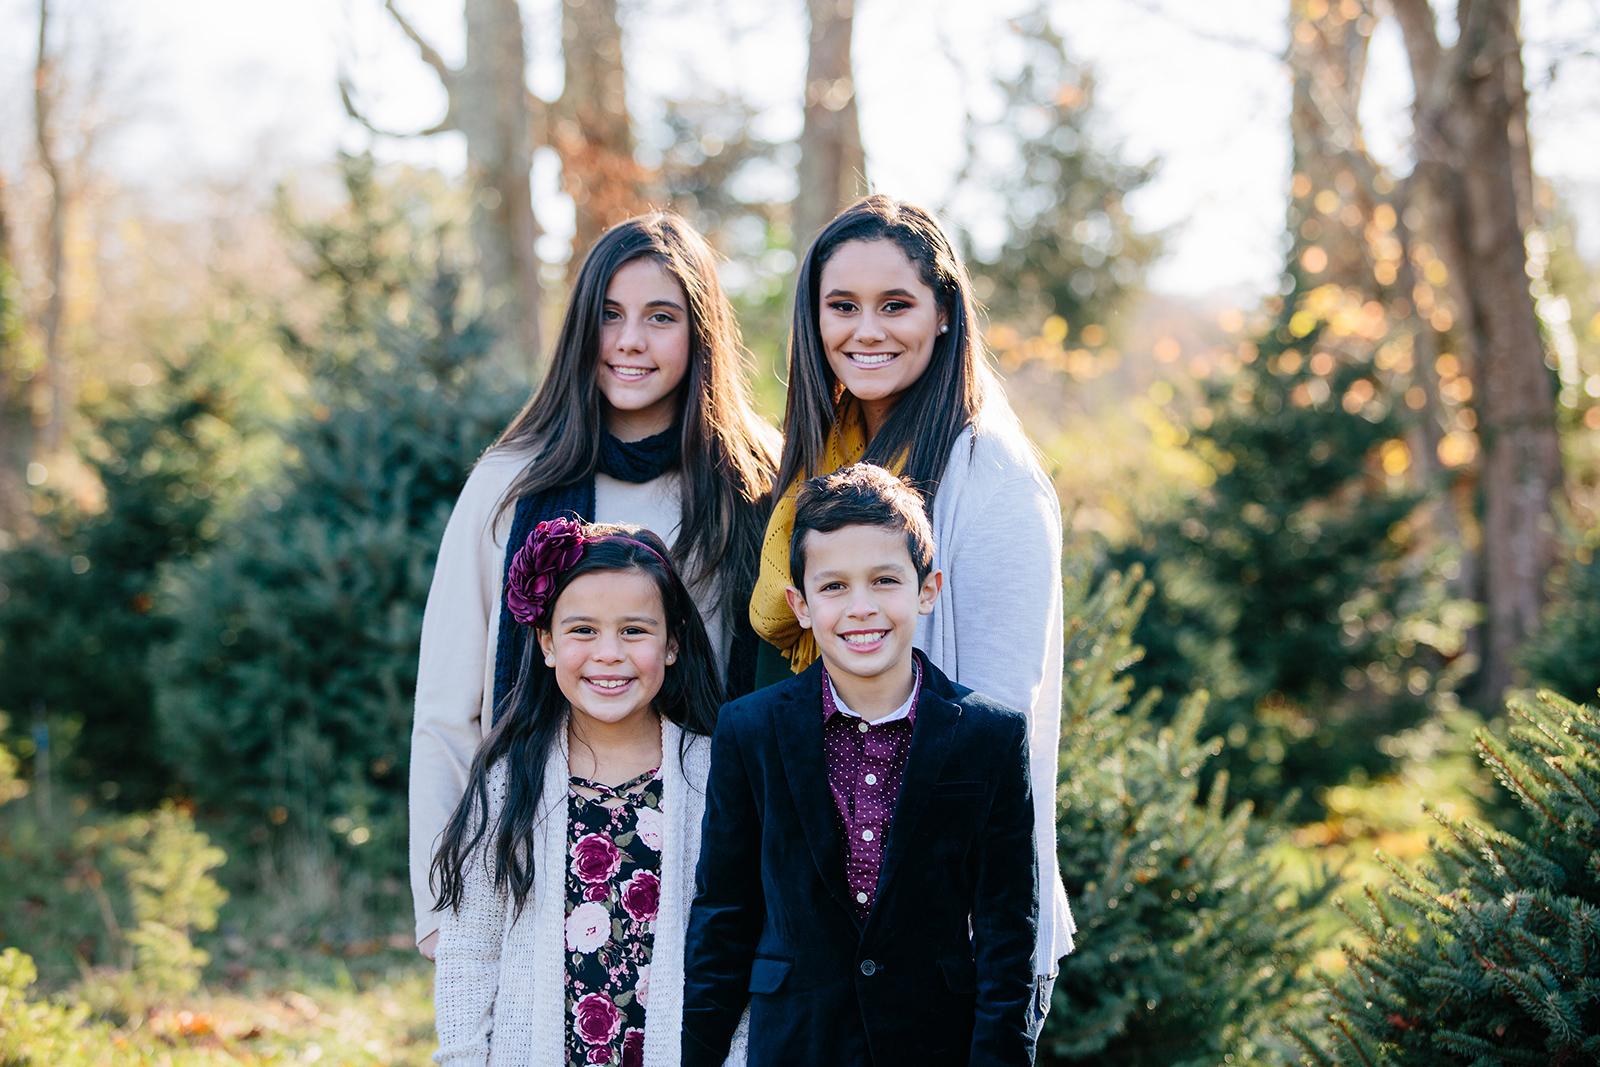 cousin family photos.jpg